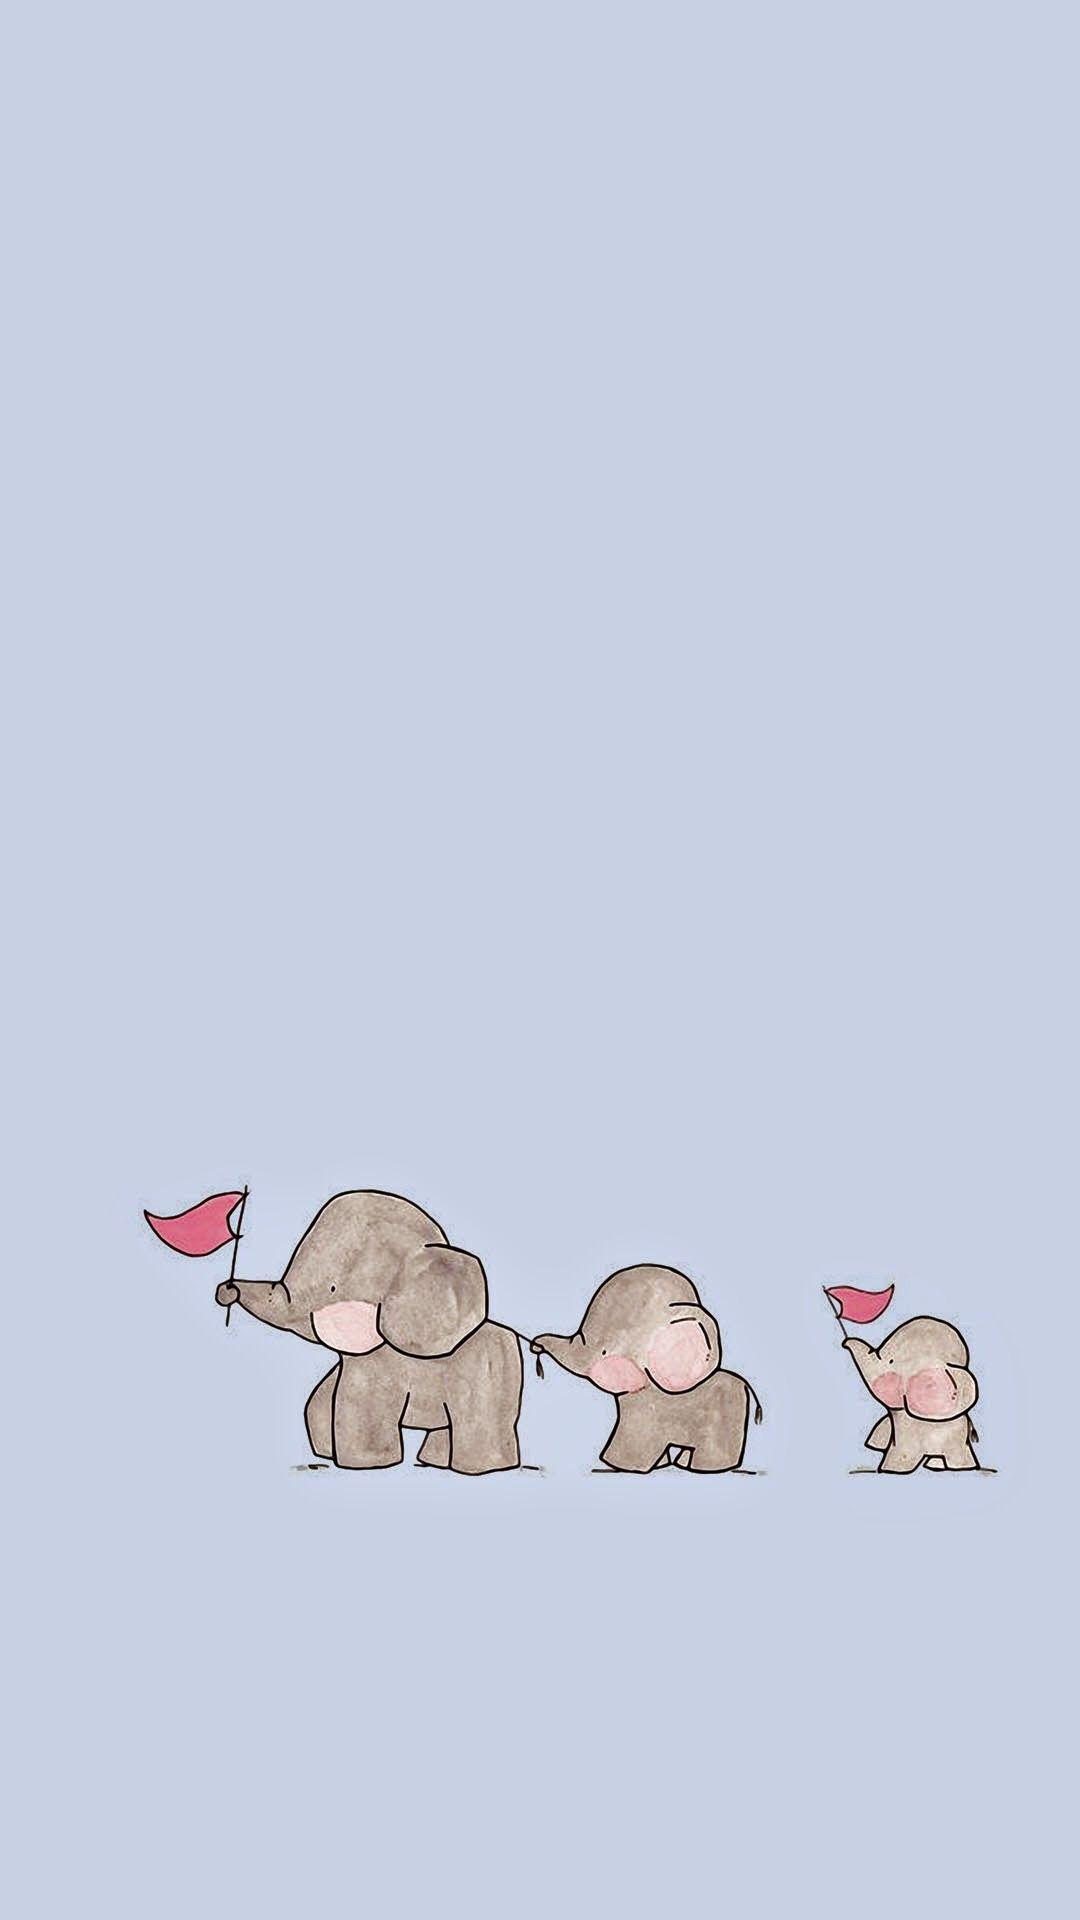 Pin By Joyce Tan On Cuteness Overload Pink Wallpaper